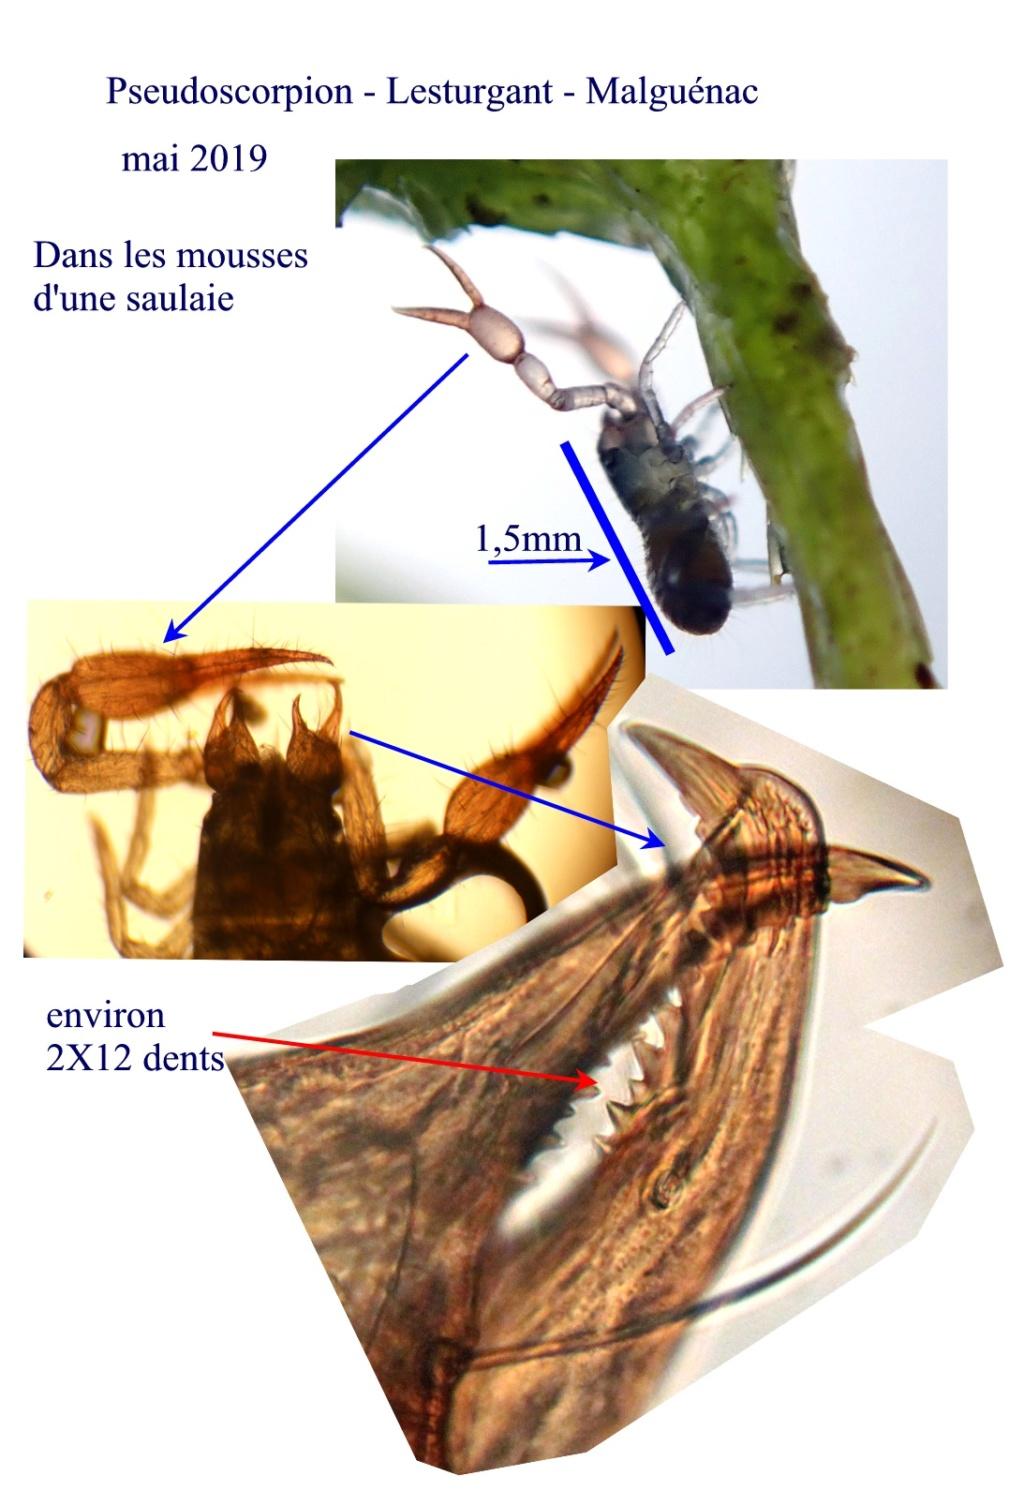 Acarien à pinces de crabe [Pseudoscorpion][Neobisium sp.] Pseudo10